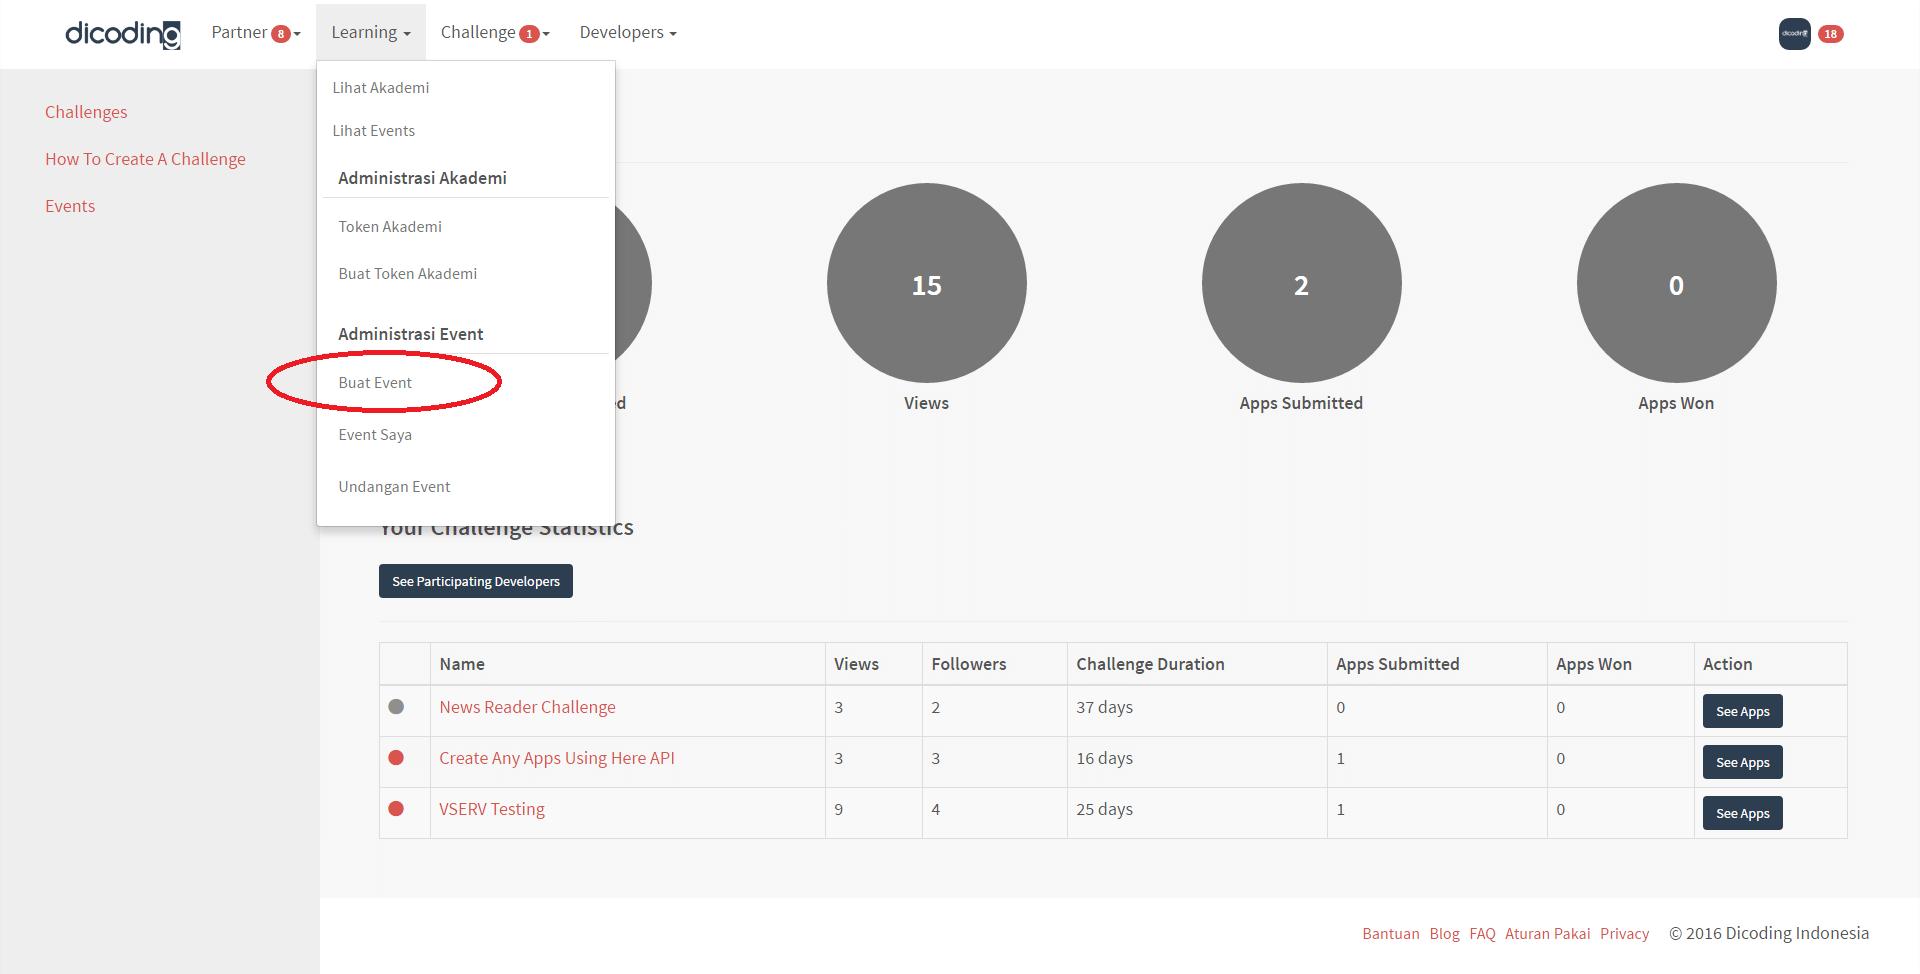 screencapture-dicoding-dashboard-partners-challenges-1482123831154